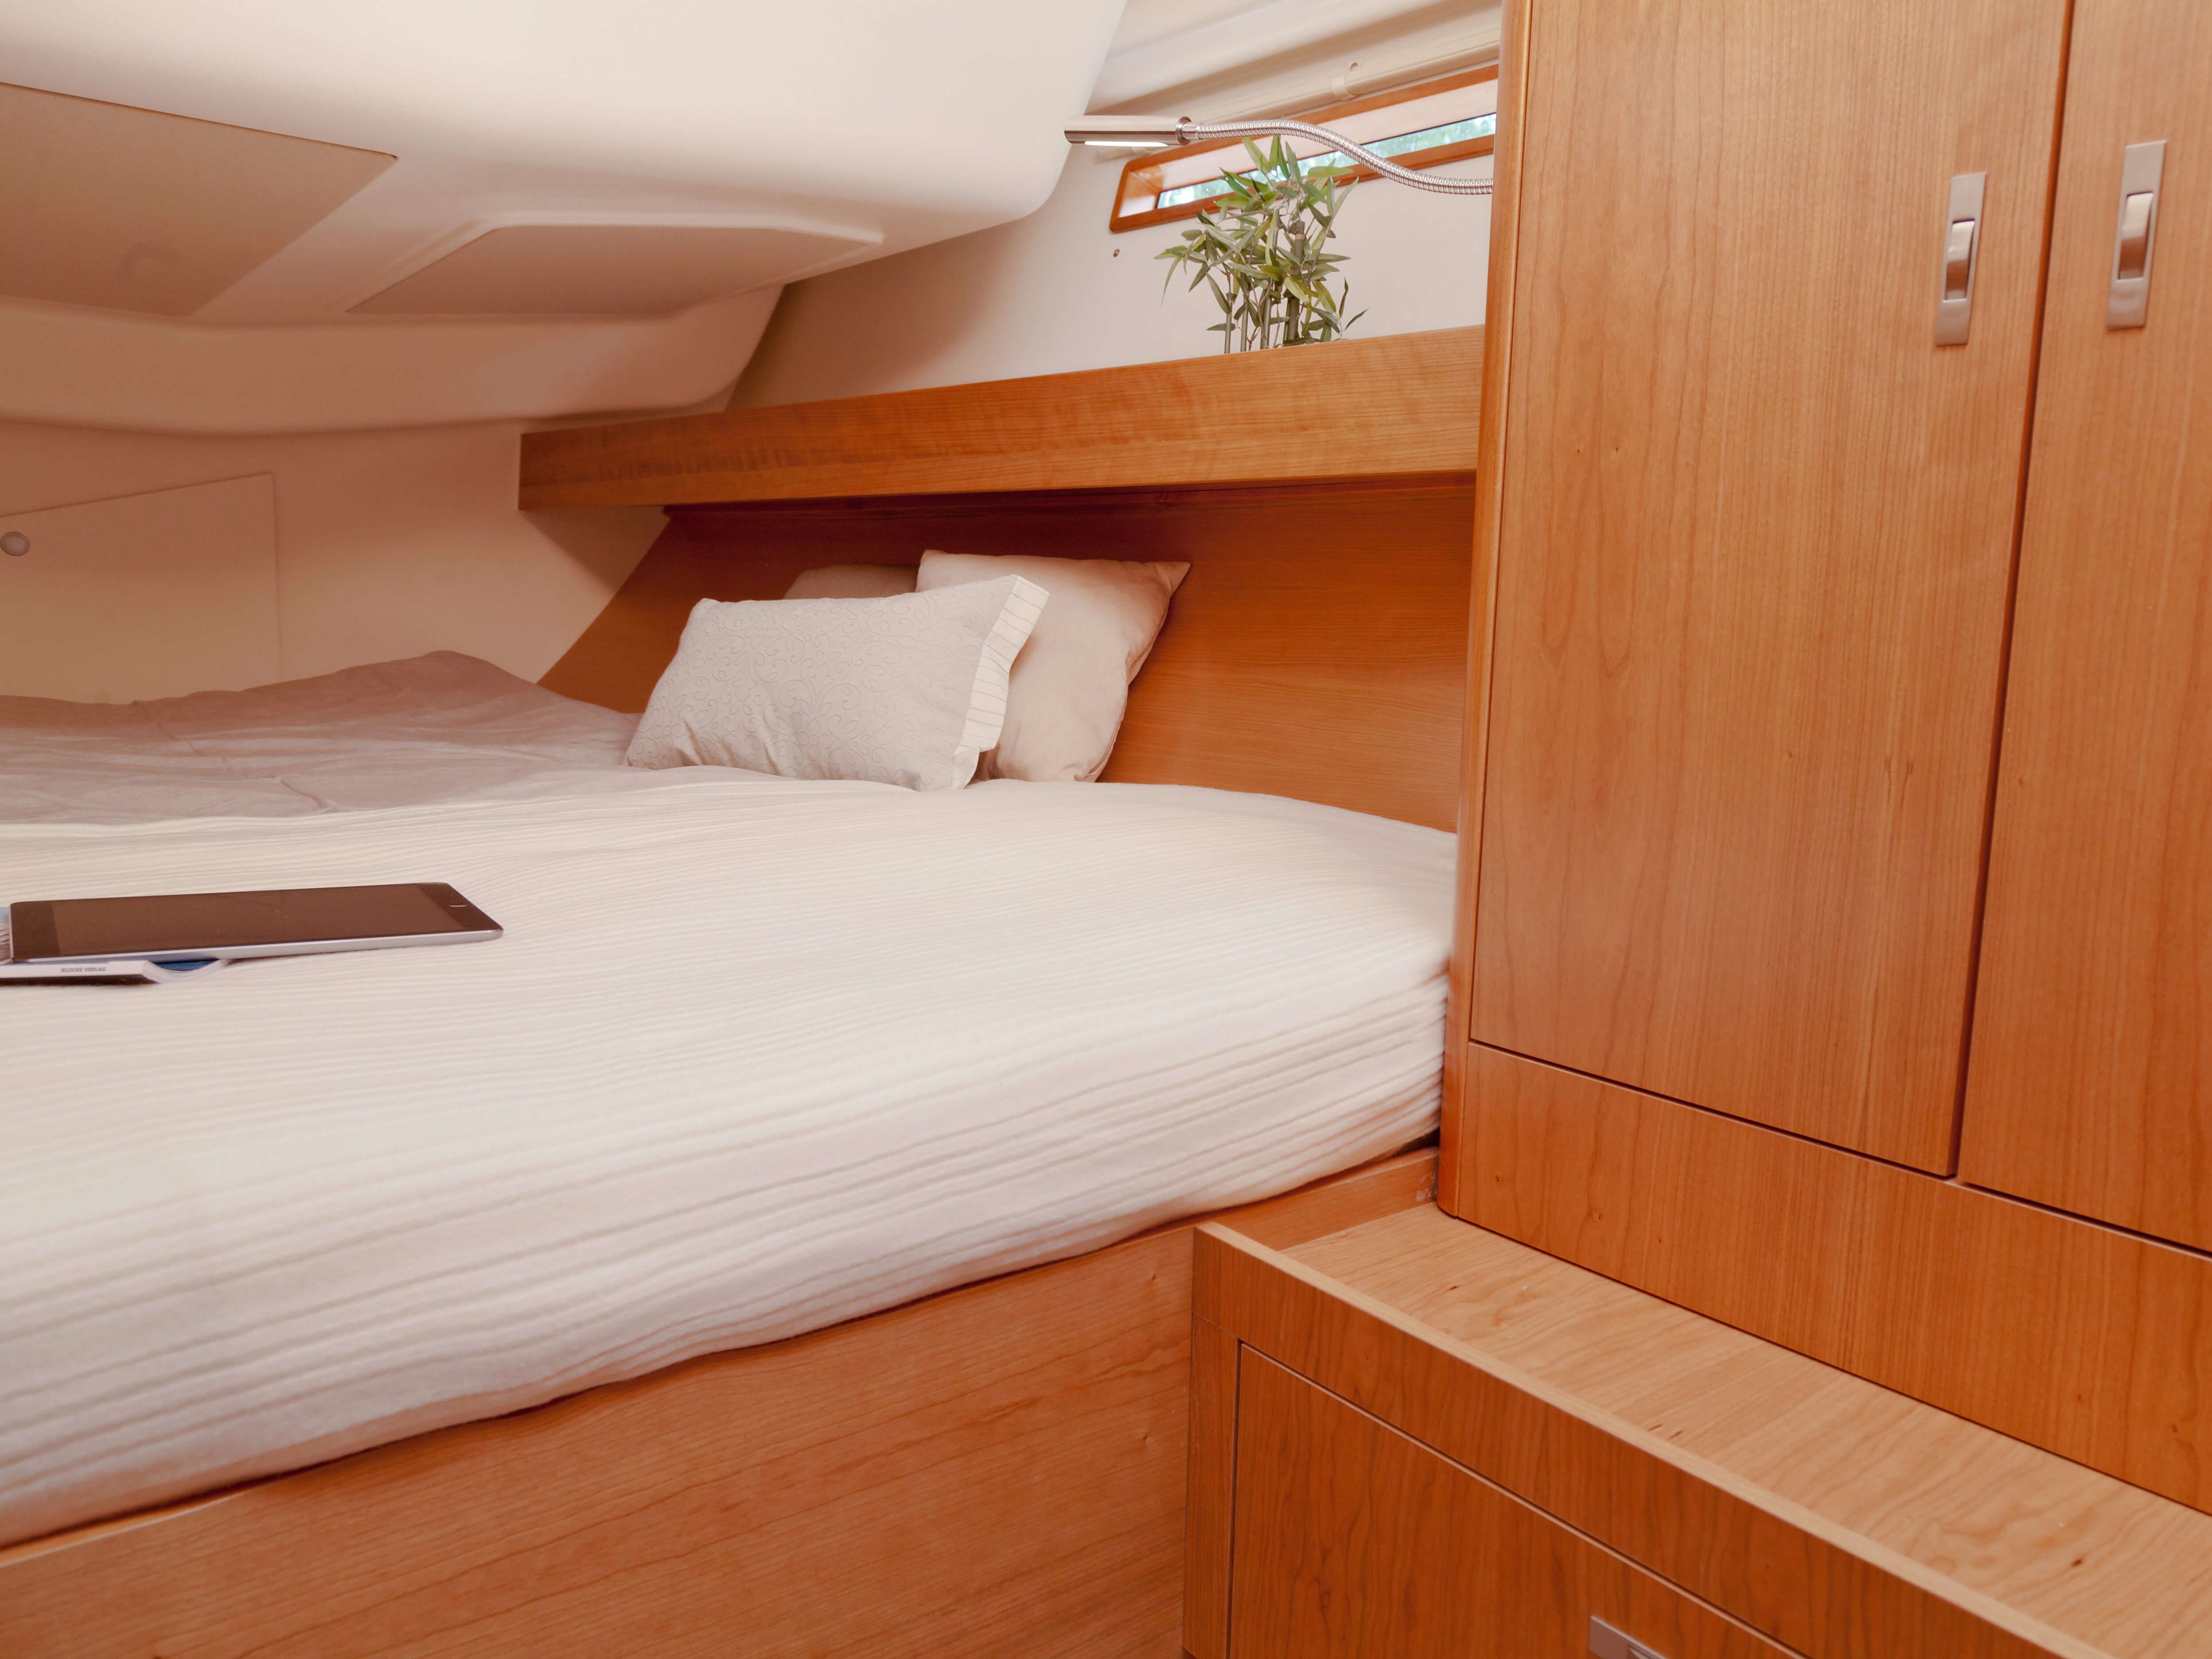 Dehler 46 Vista interior cabina da popa | cama doble, compartimento de almacenamiento | Dehler